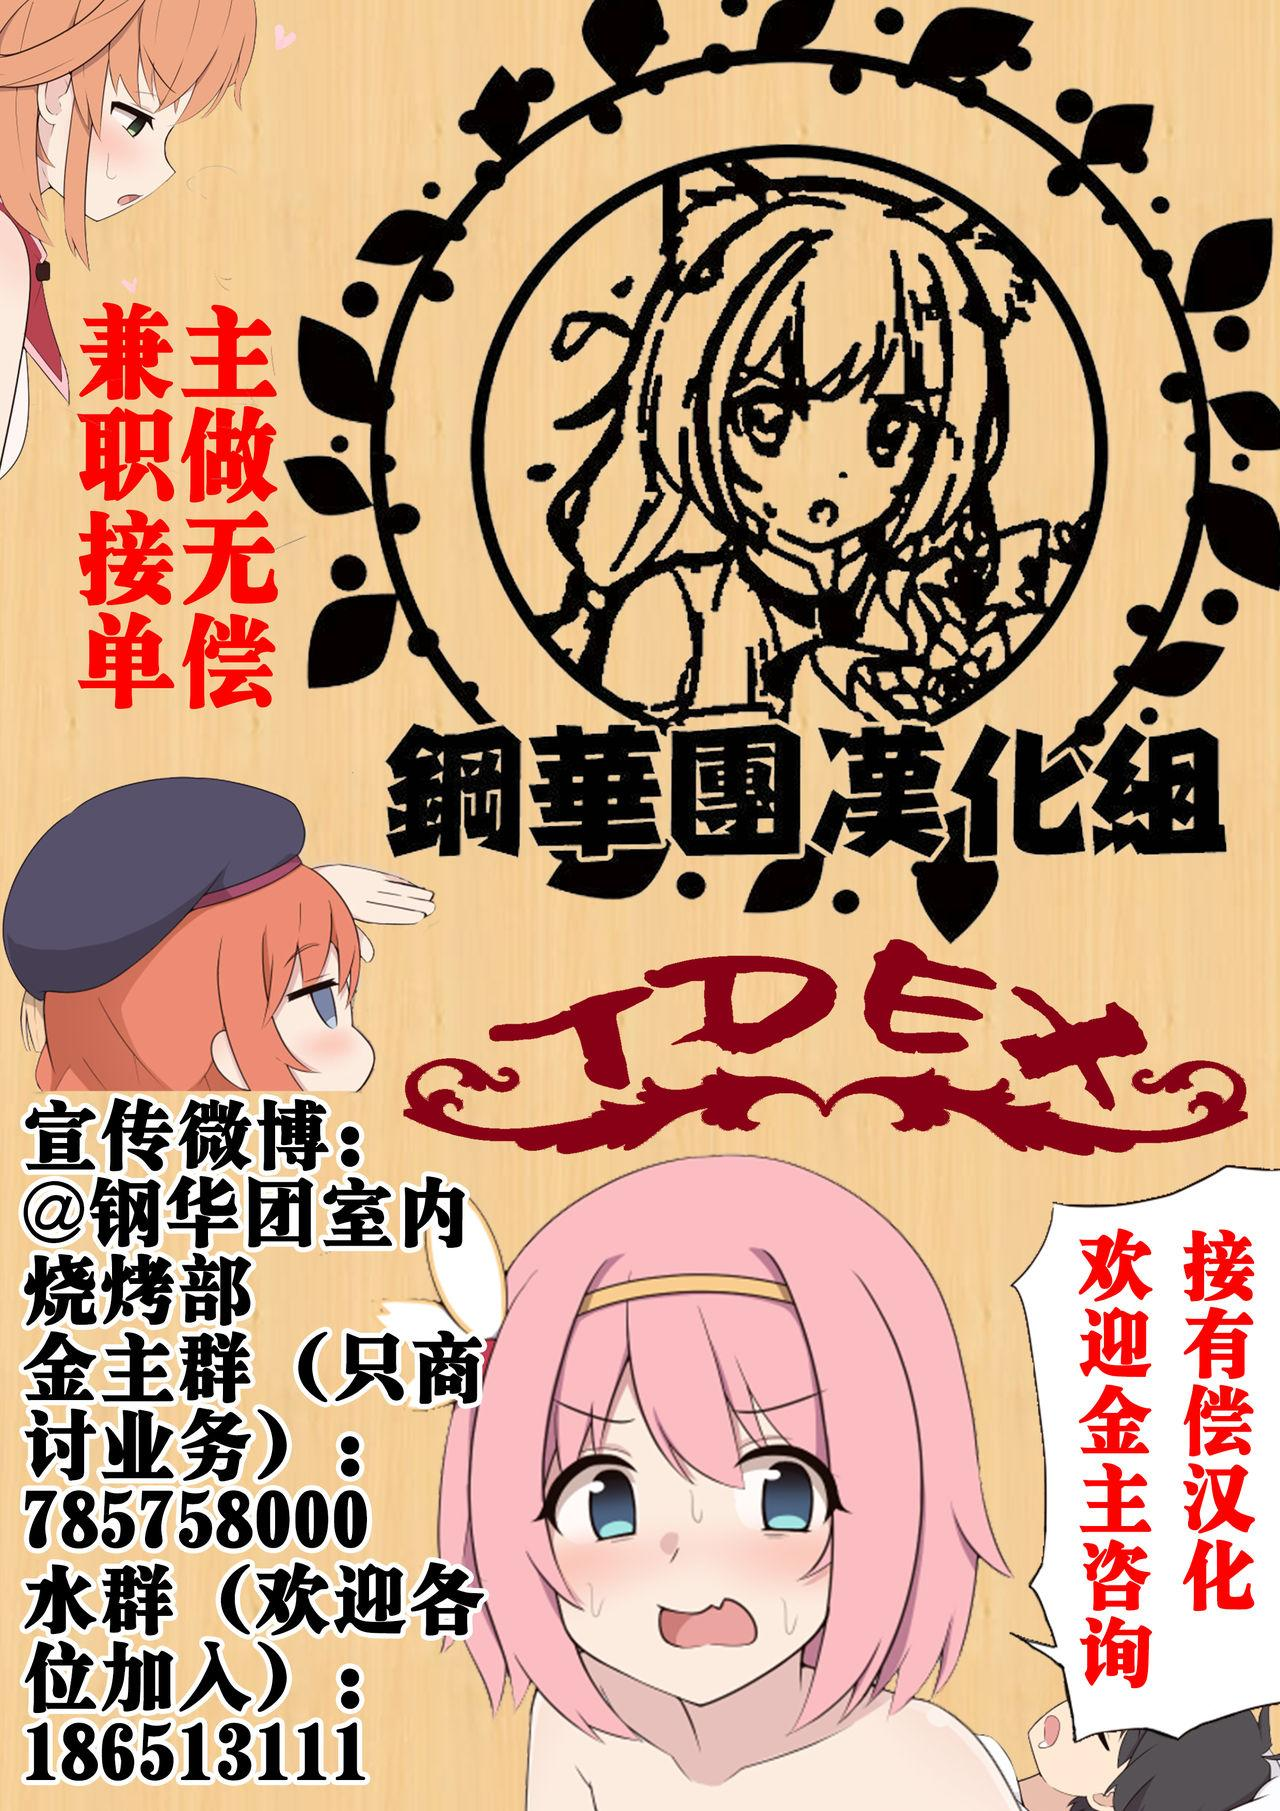 (COMIC1☆16) [Toto-taste (Suzuki Toto)] Papa wa (Onii-chan wa) Watasanai (Kantai Collection -KanColle-, Azur Lane) [Chinese] [钢华团汉化组] 23